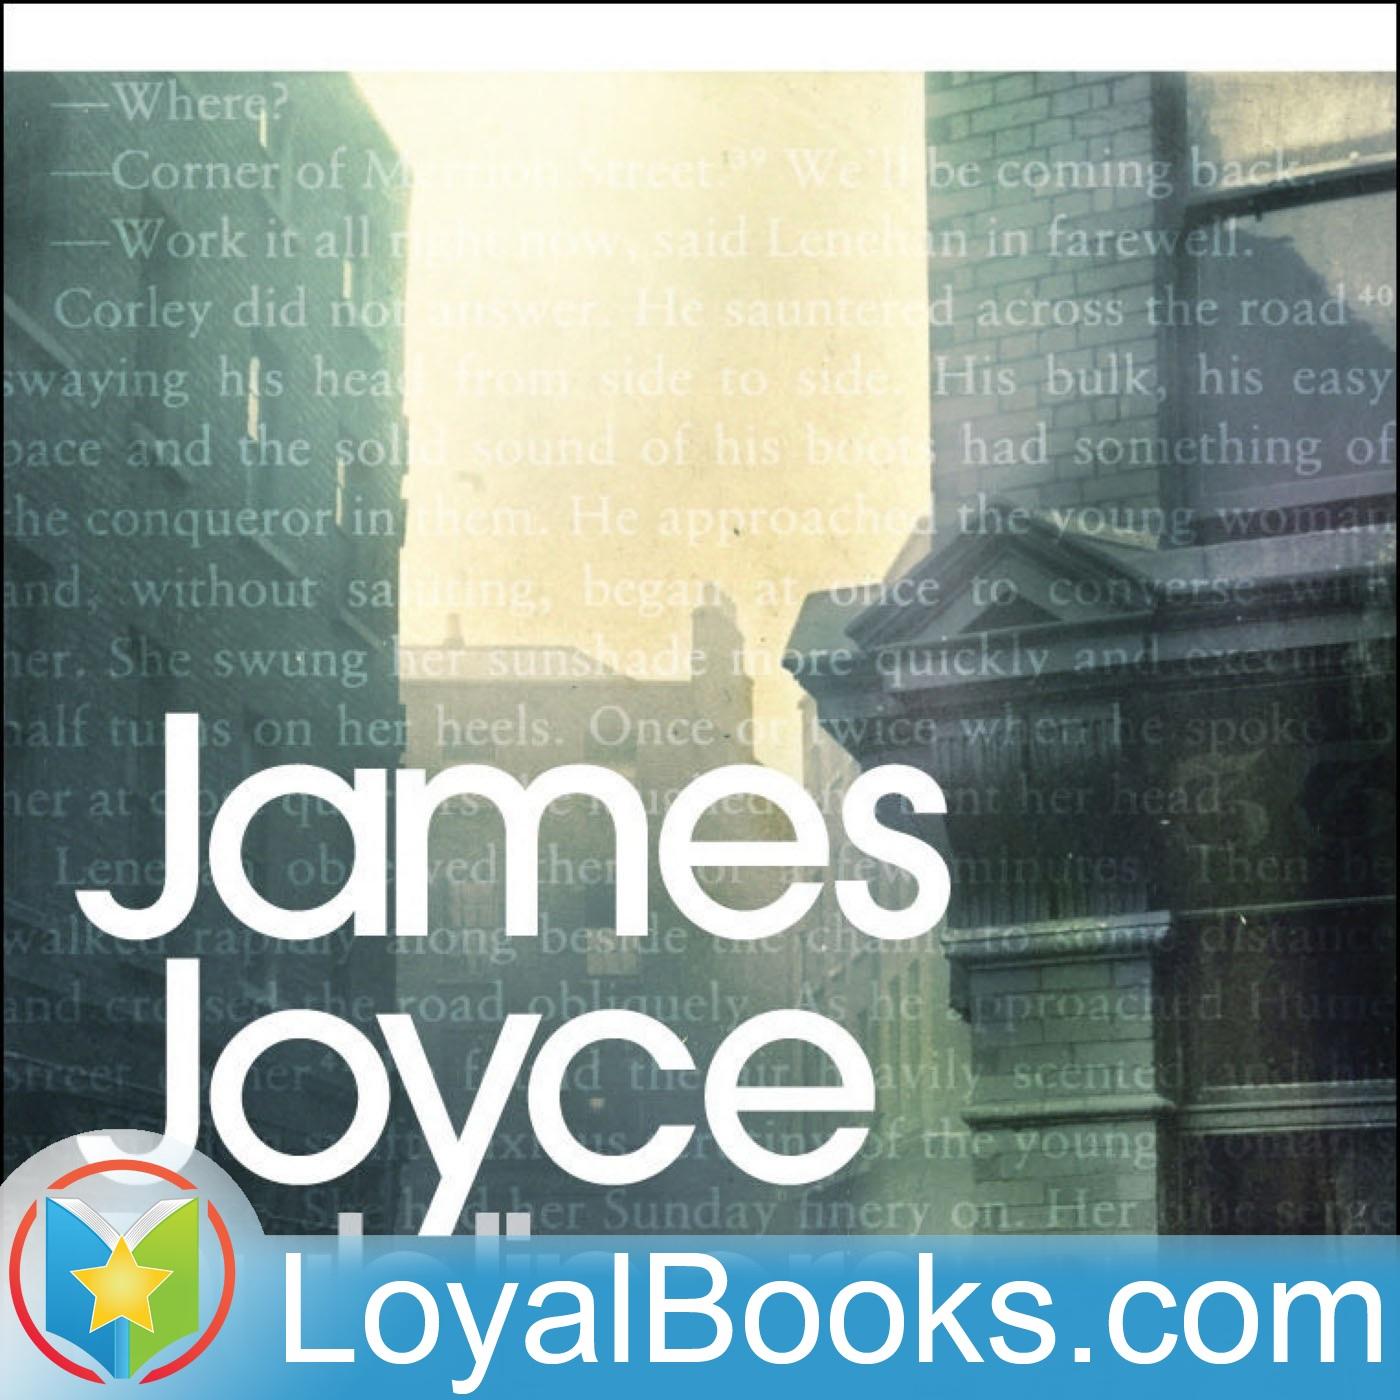 <![CDATA[Dubliners by James Joyce]]>